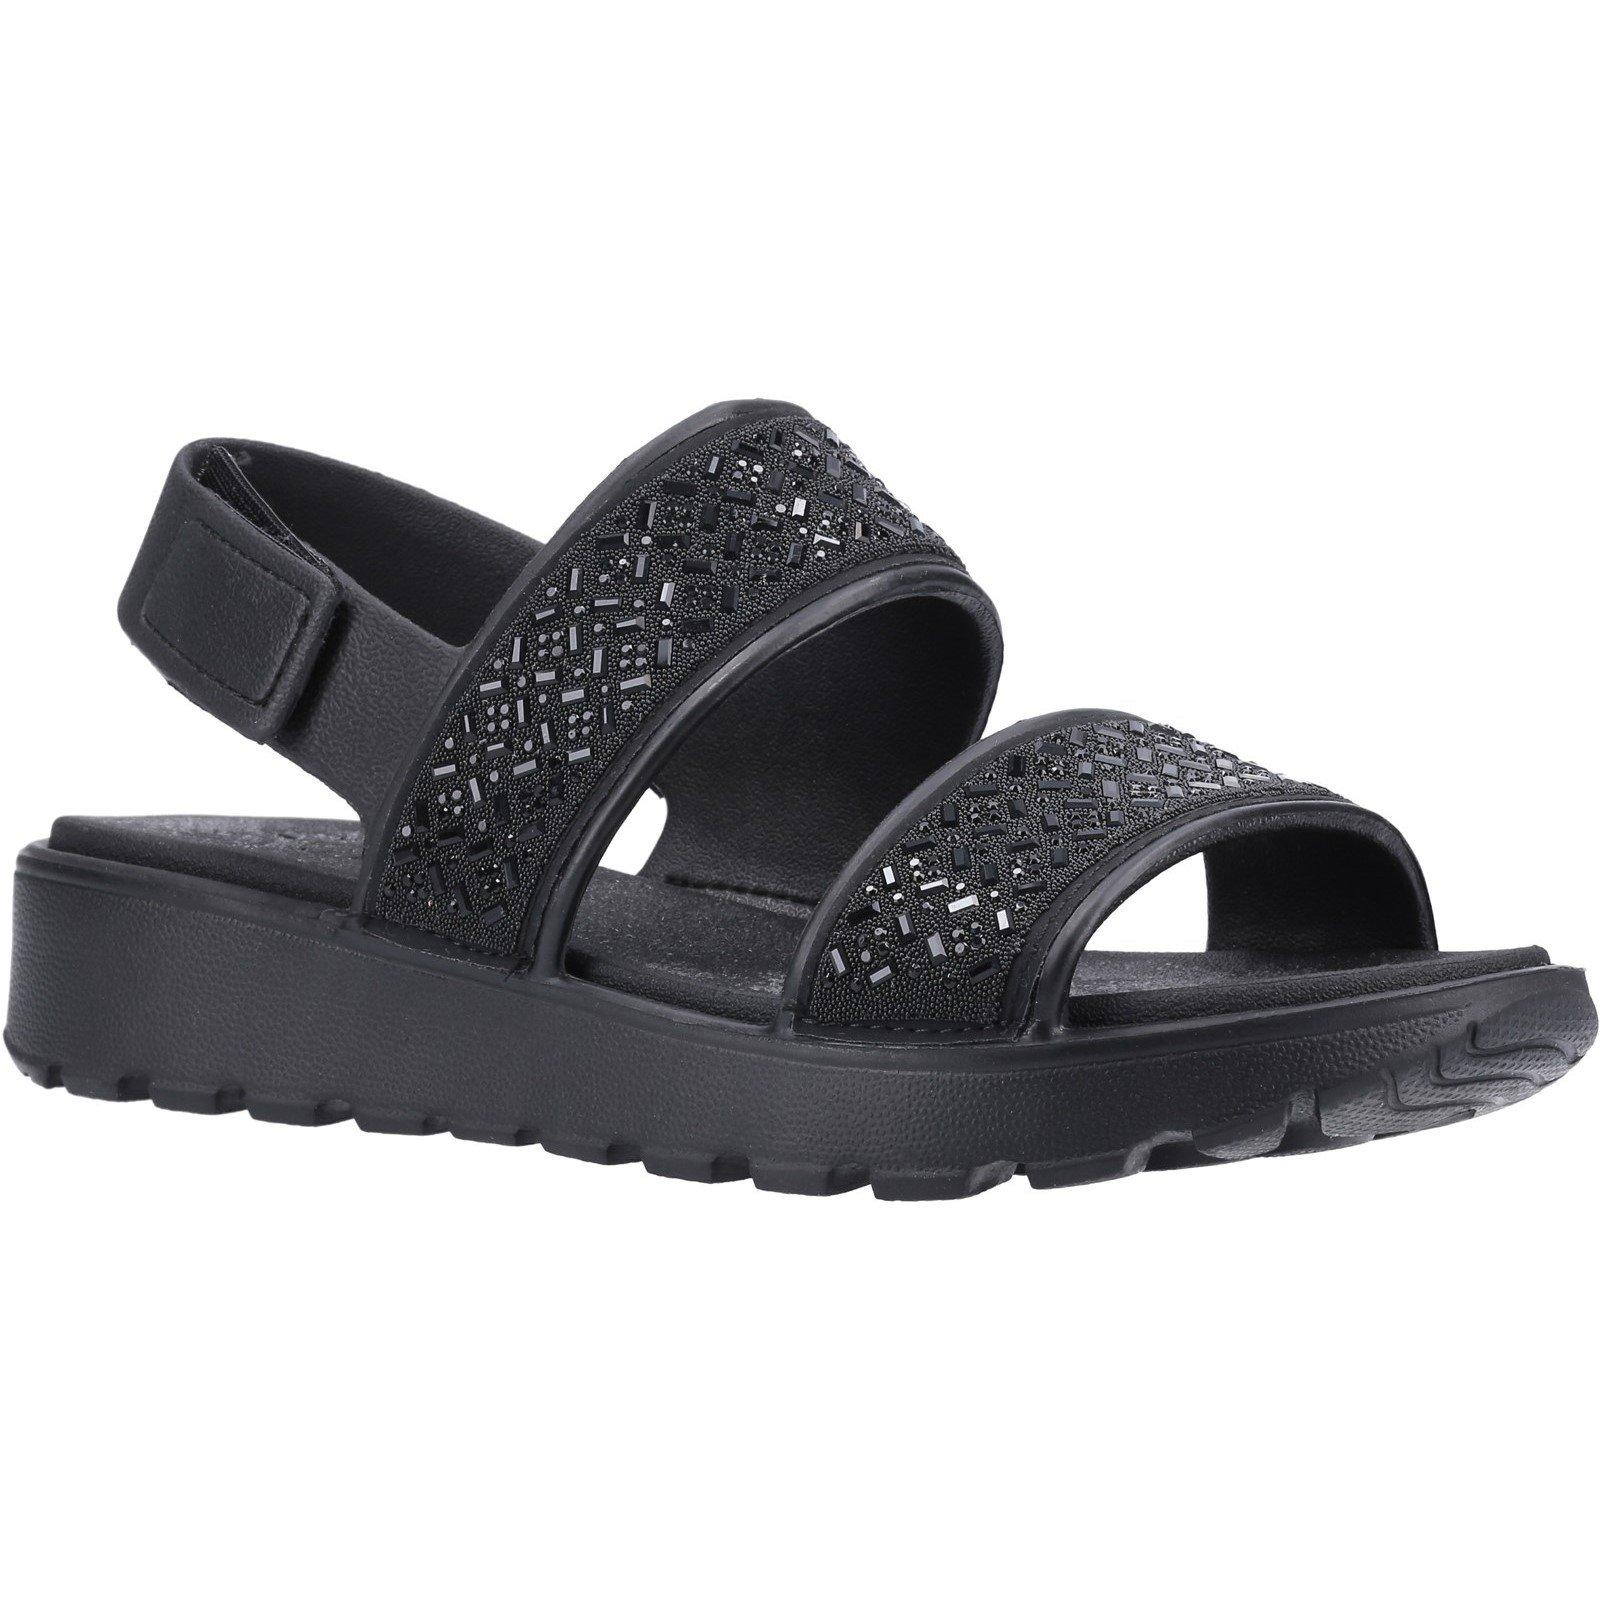 Skechers Women's Footsteps Glam Party Sandal Black 32369 - Black 8